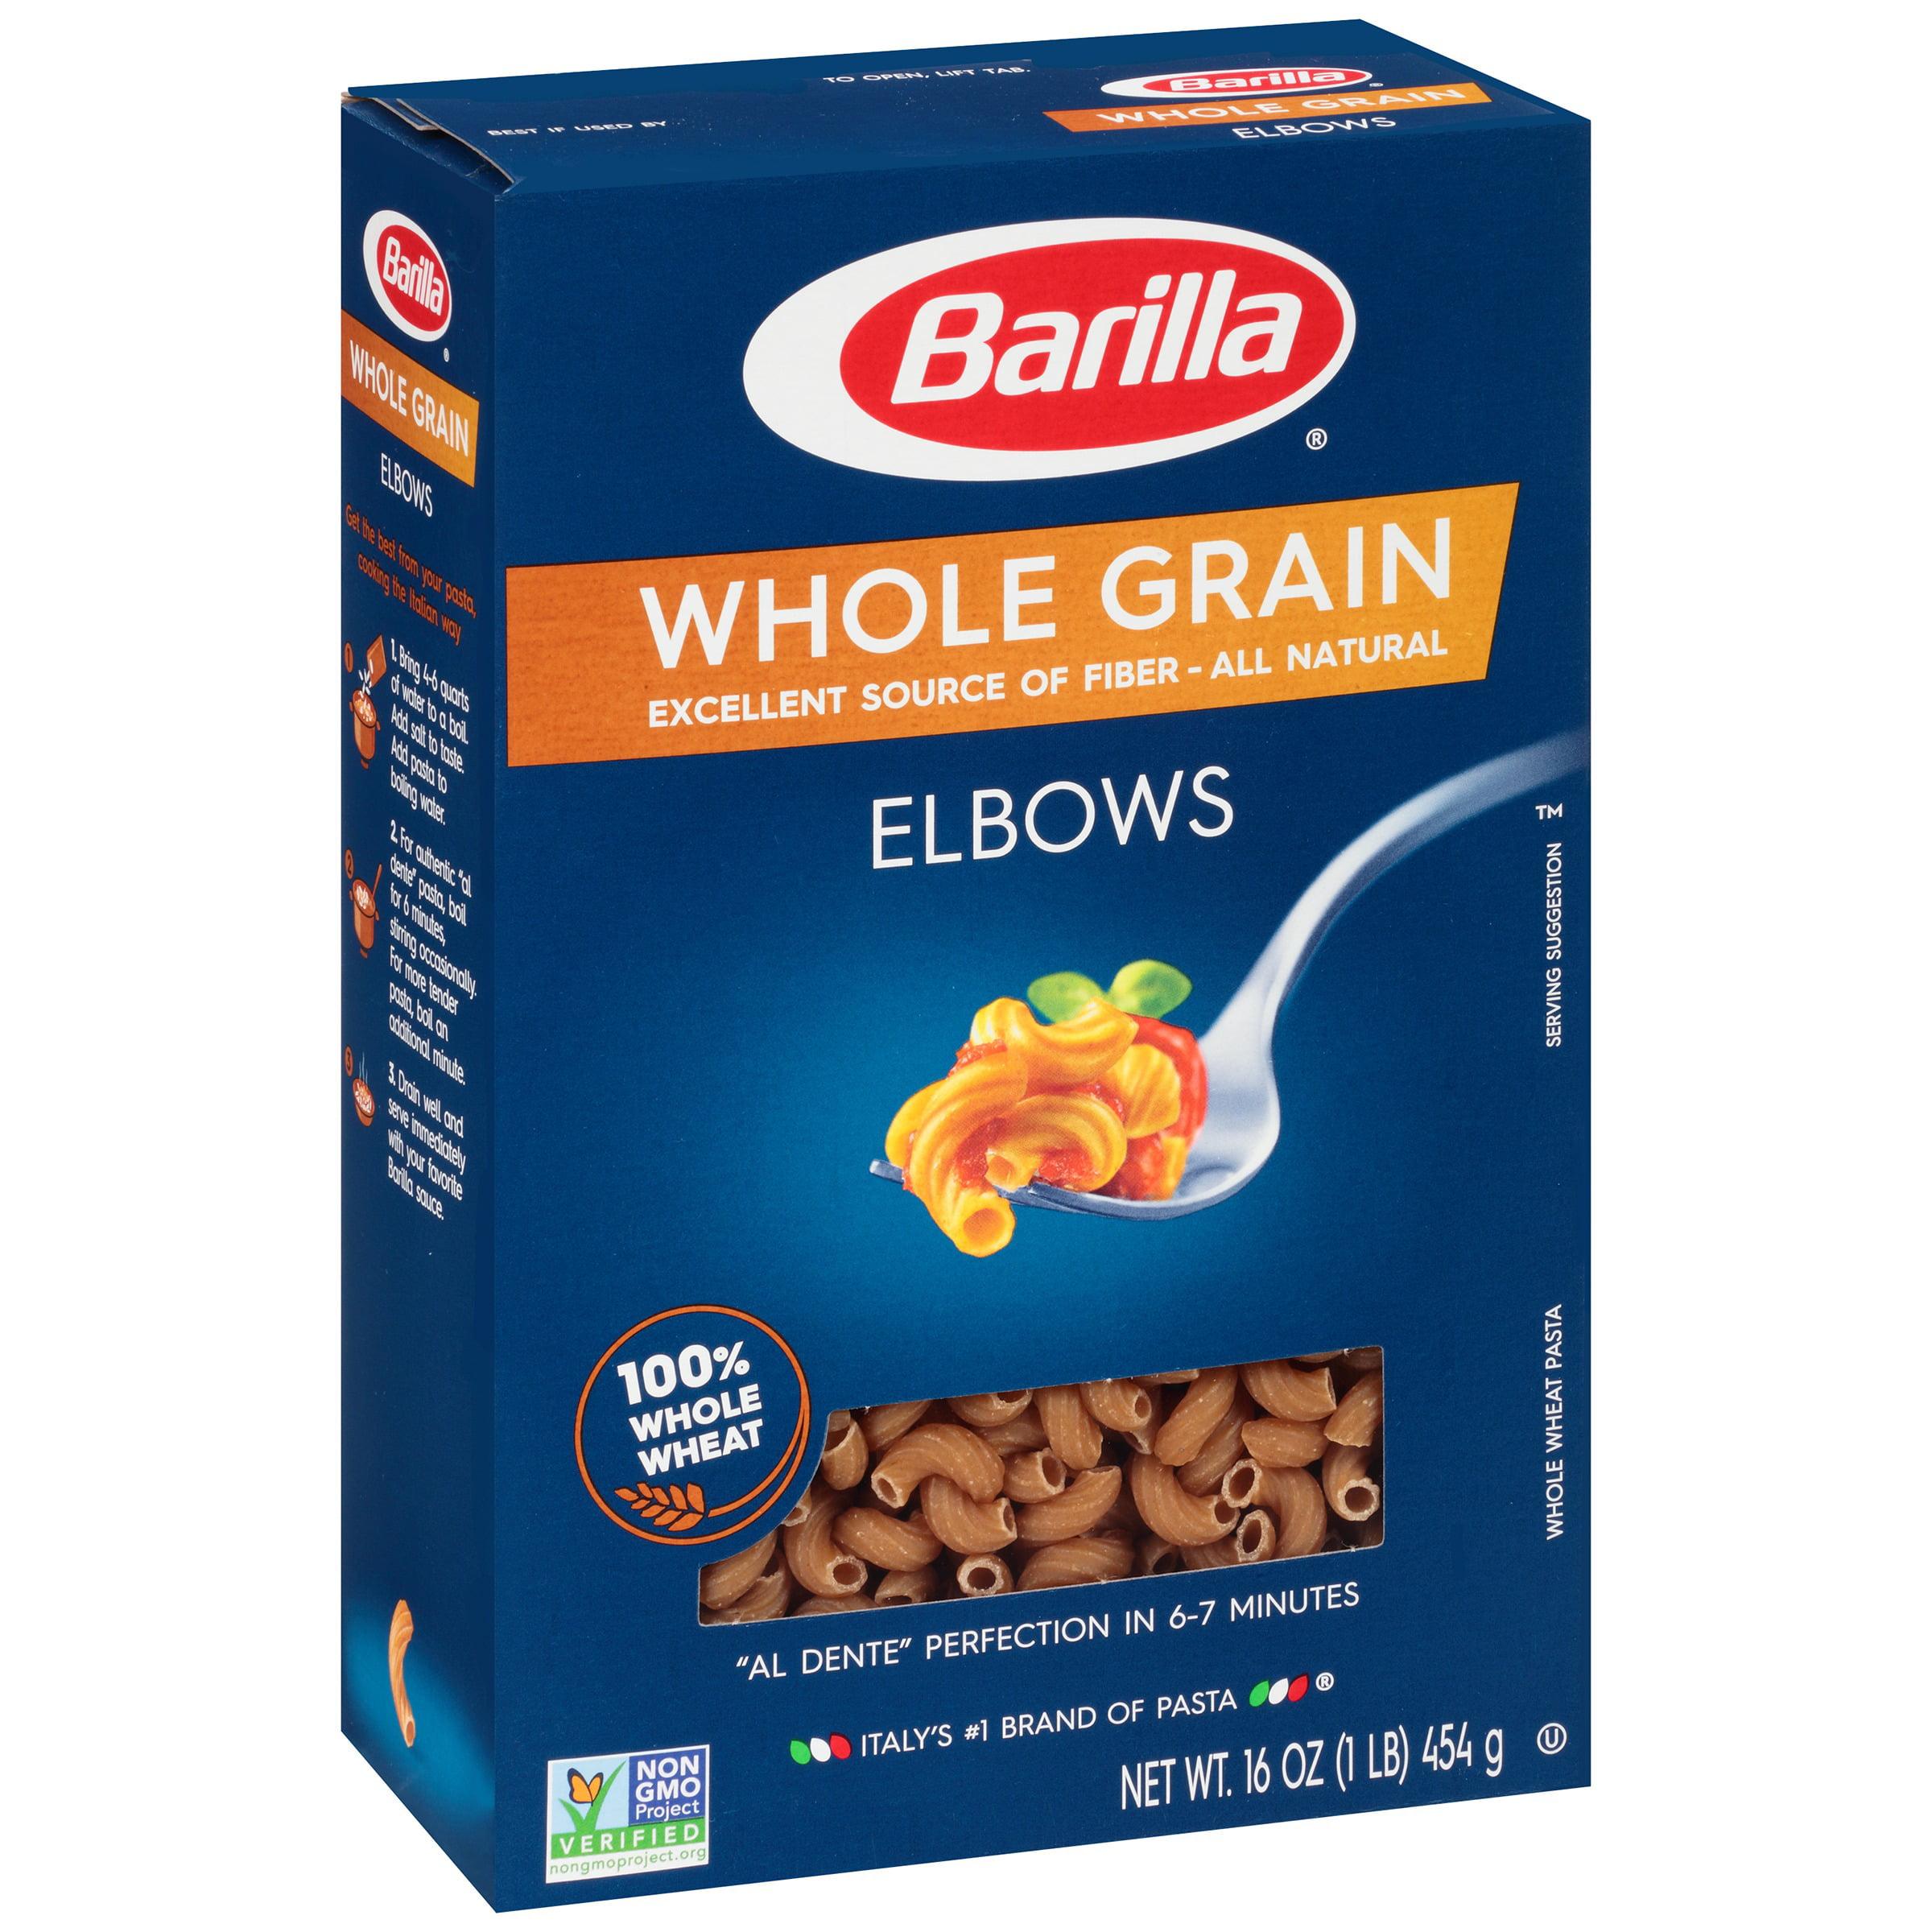 Barilla Whole Grain Elbows Pasta 16 Oz Box Walmart